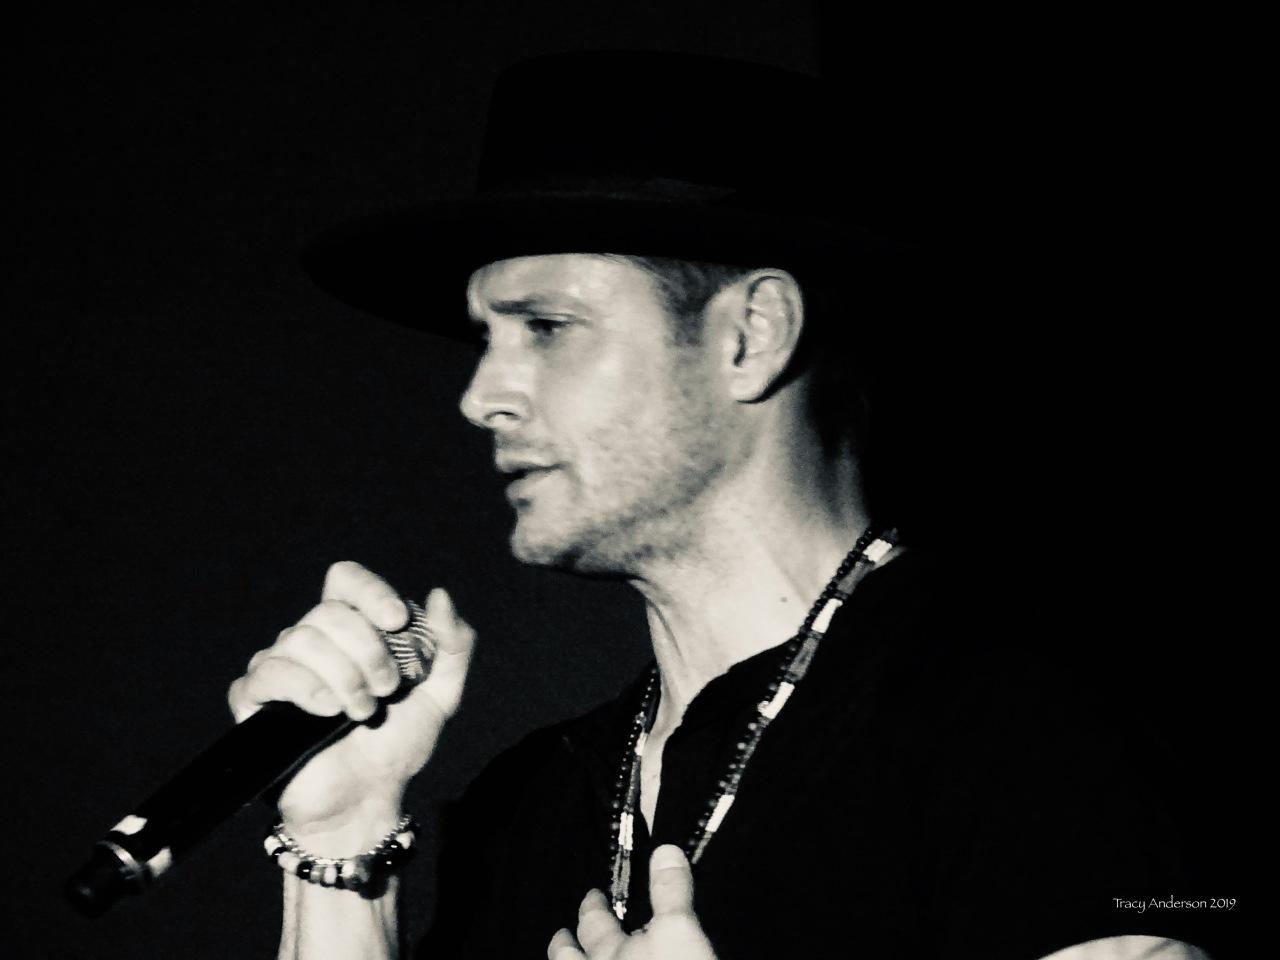 Jensen Ackles singing with Louden Swain SPNVan Con Aug 23-25 2019